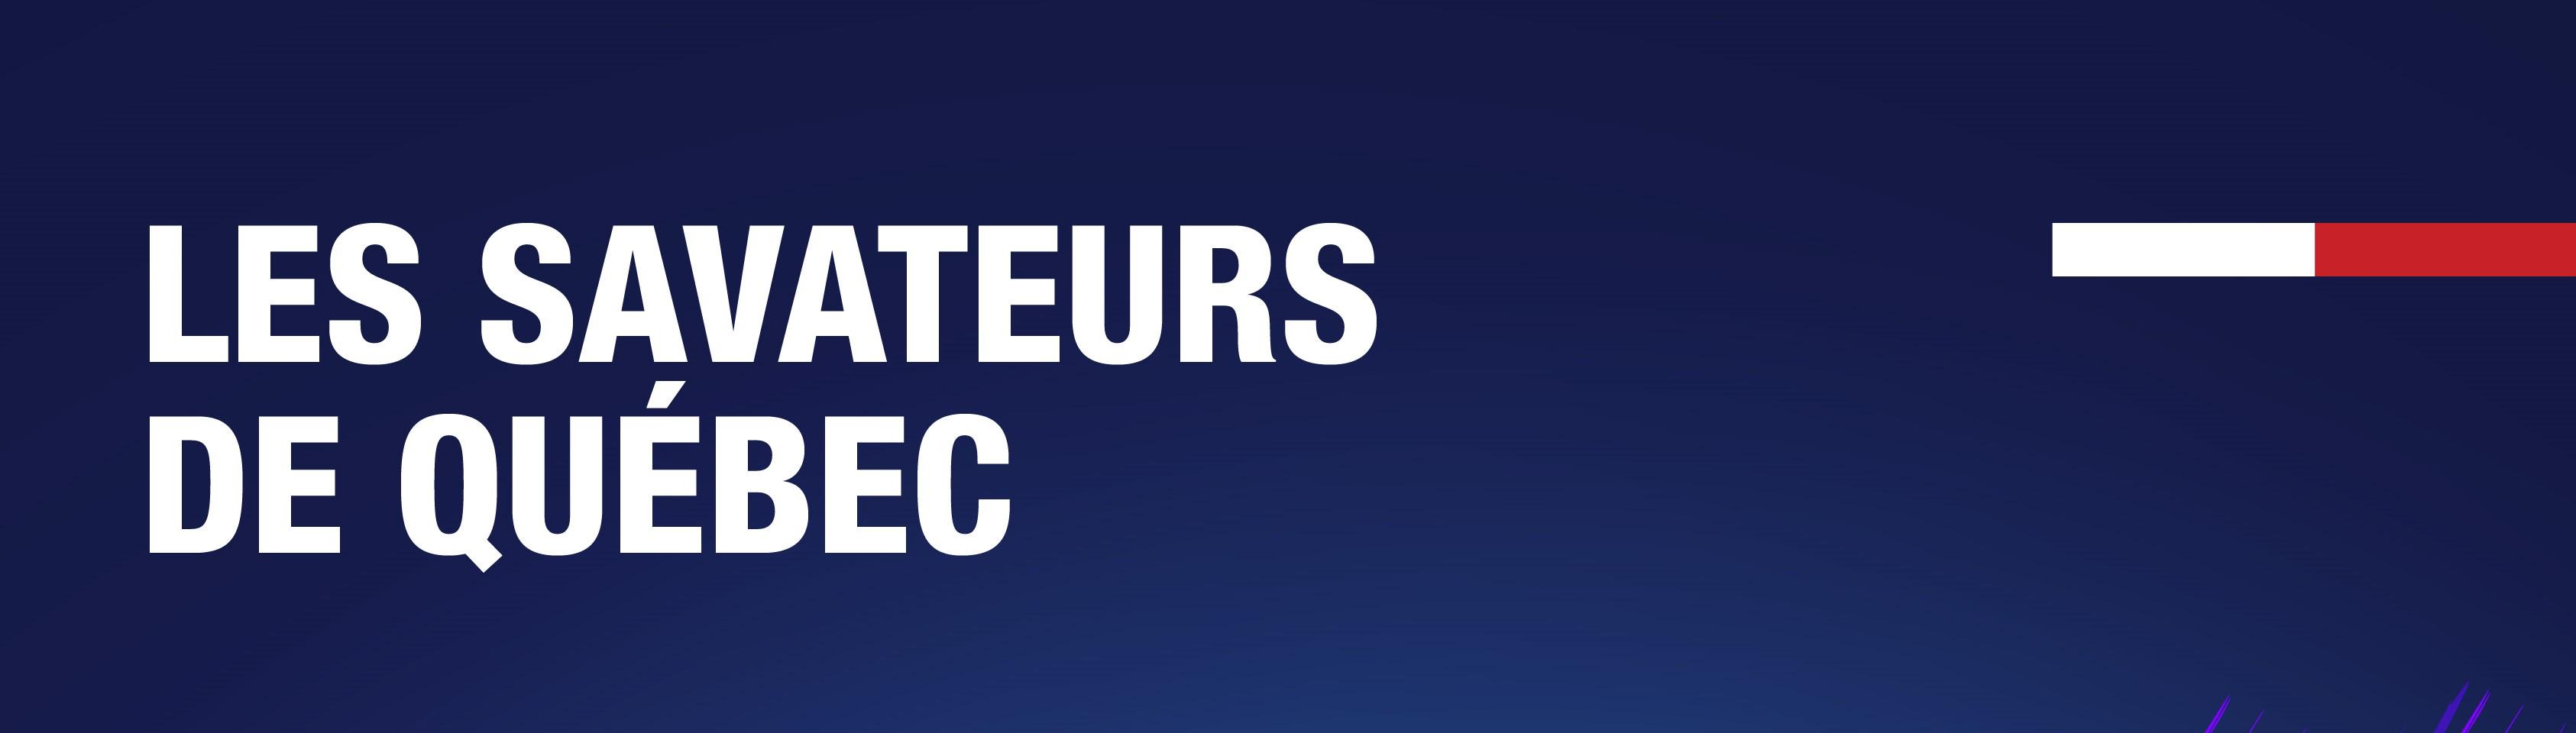 Savateurs de Québec